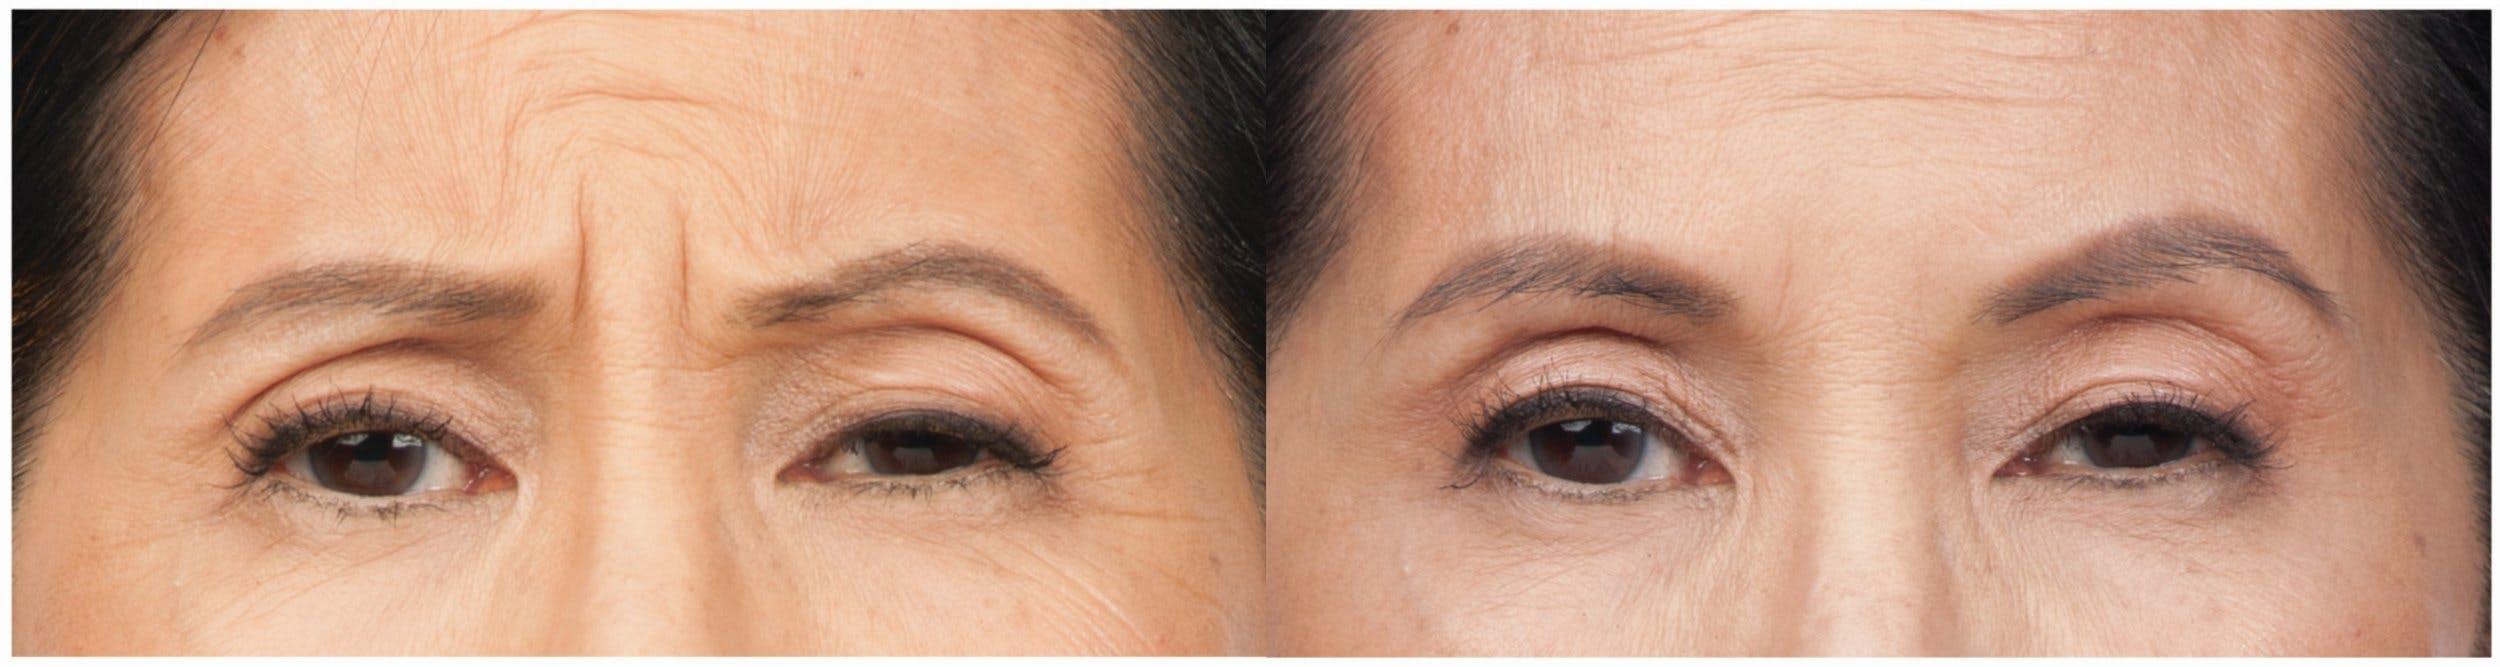 Botox & Dysport Gallery - Patient 58178942 - Image 2